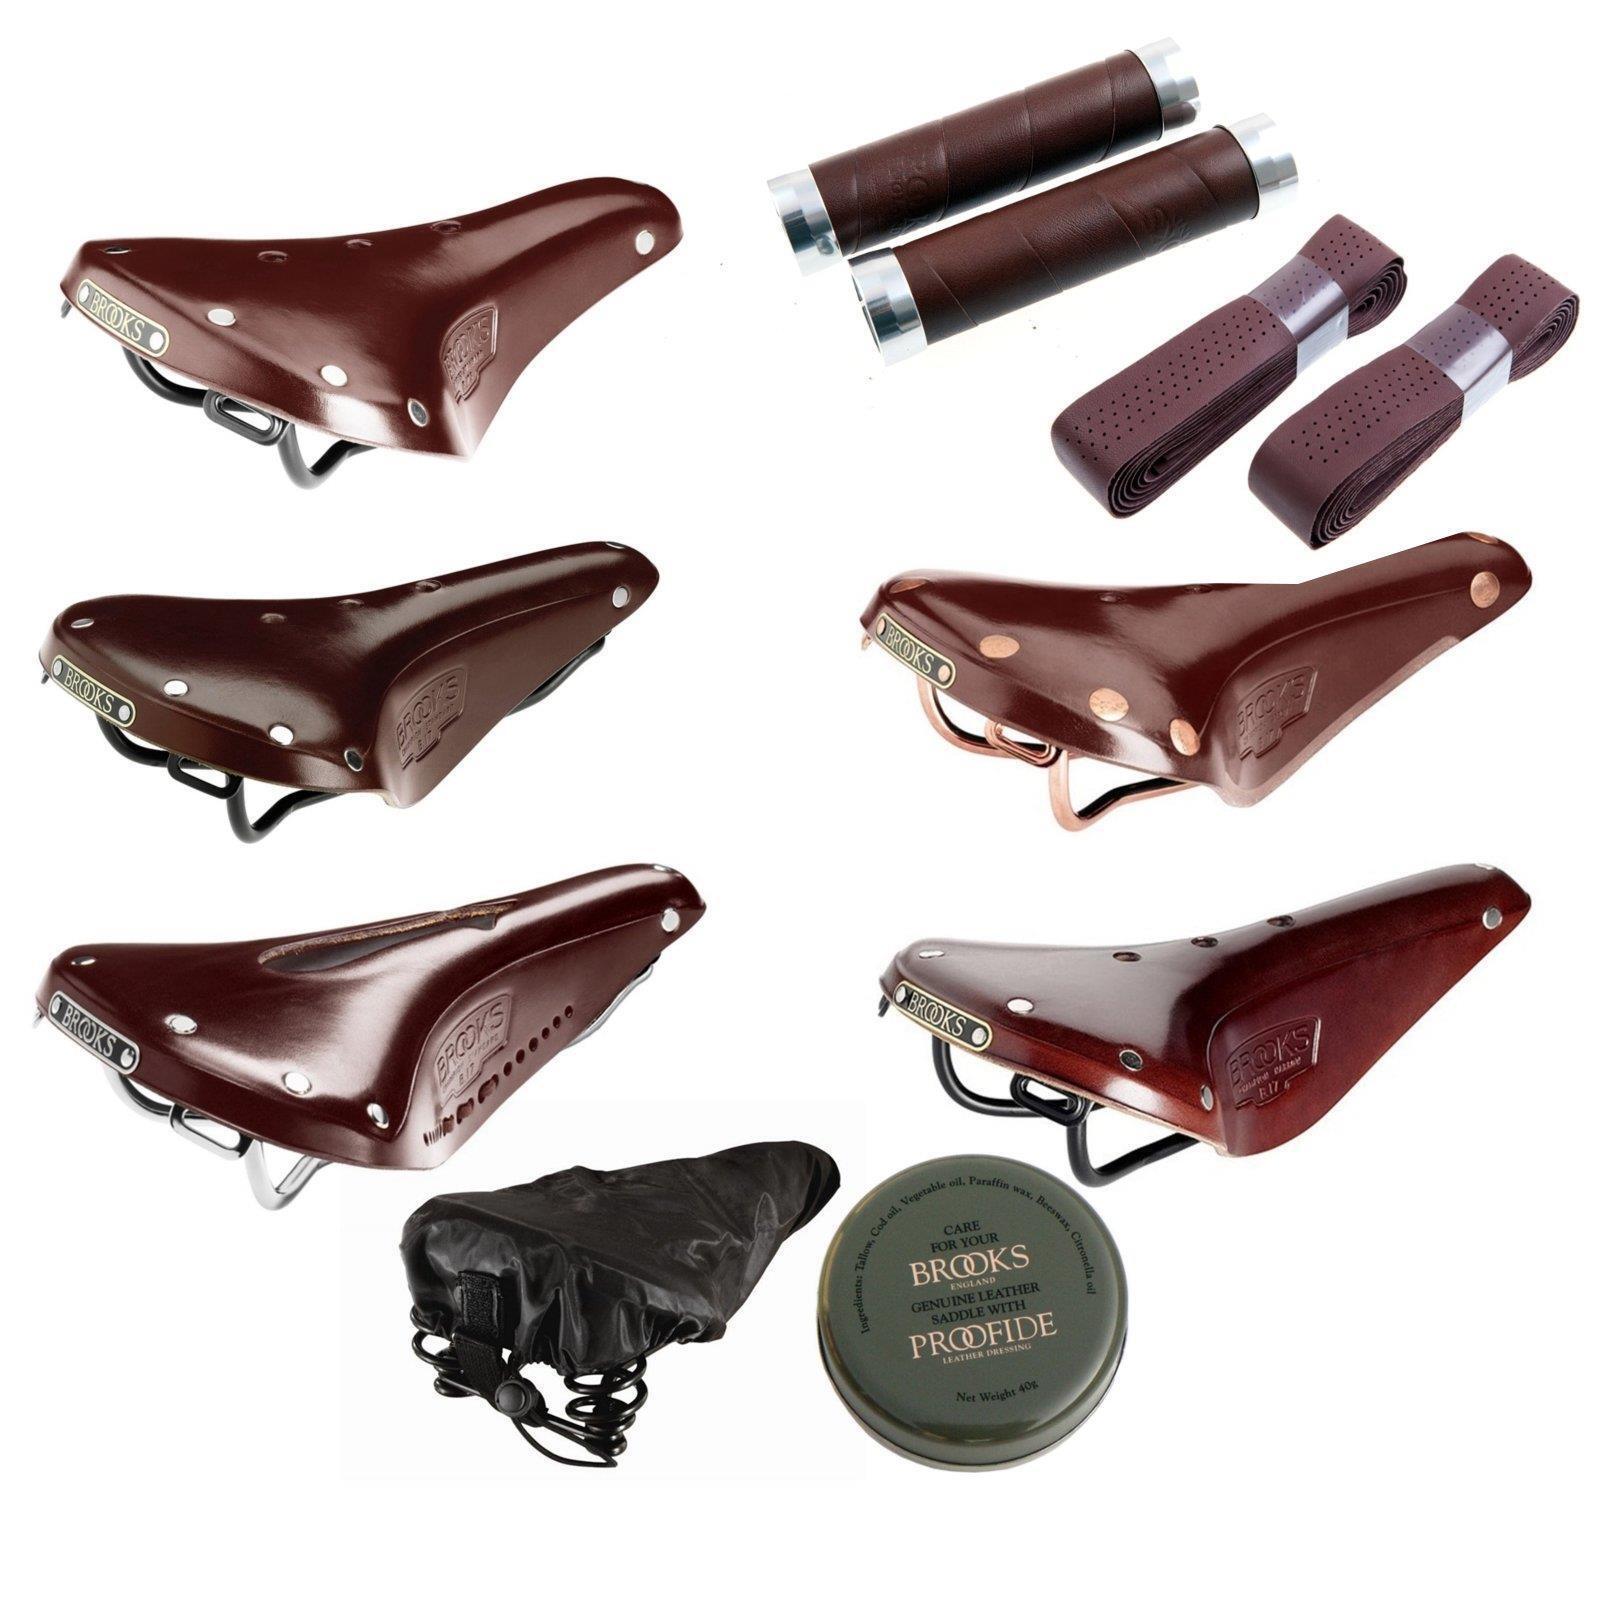 Brooks b17 Herren Ladies Saddle braun Standard Narrow Imperial Lenker Griffe